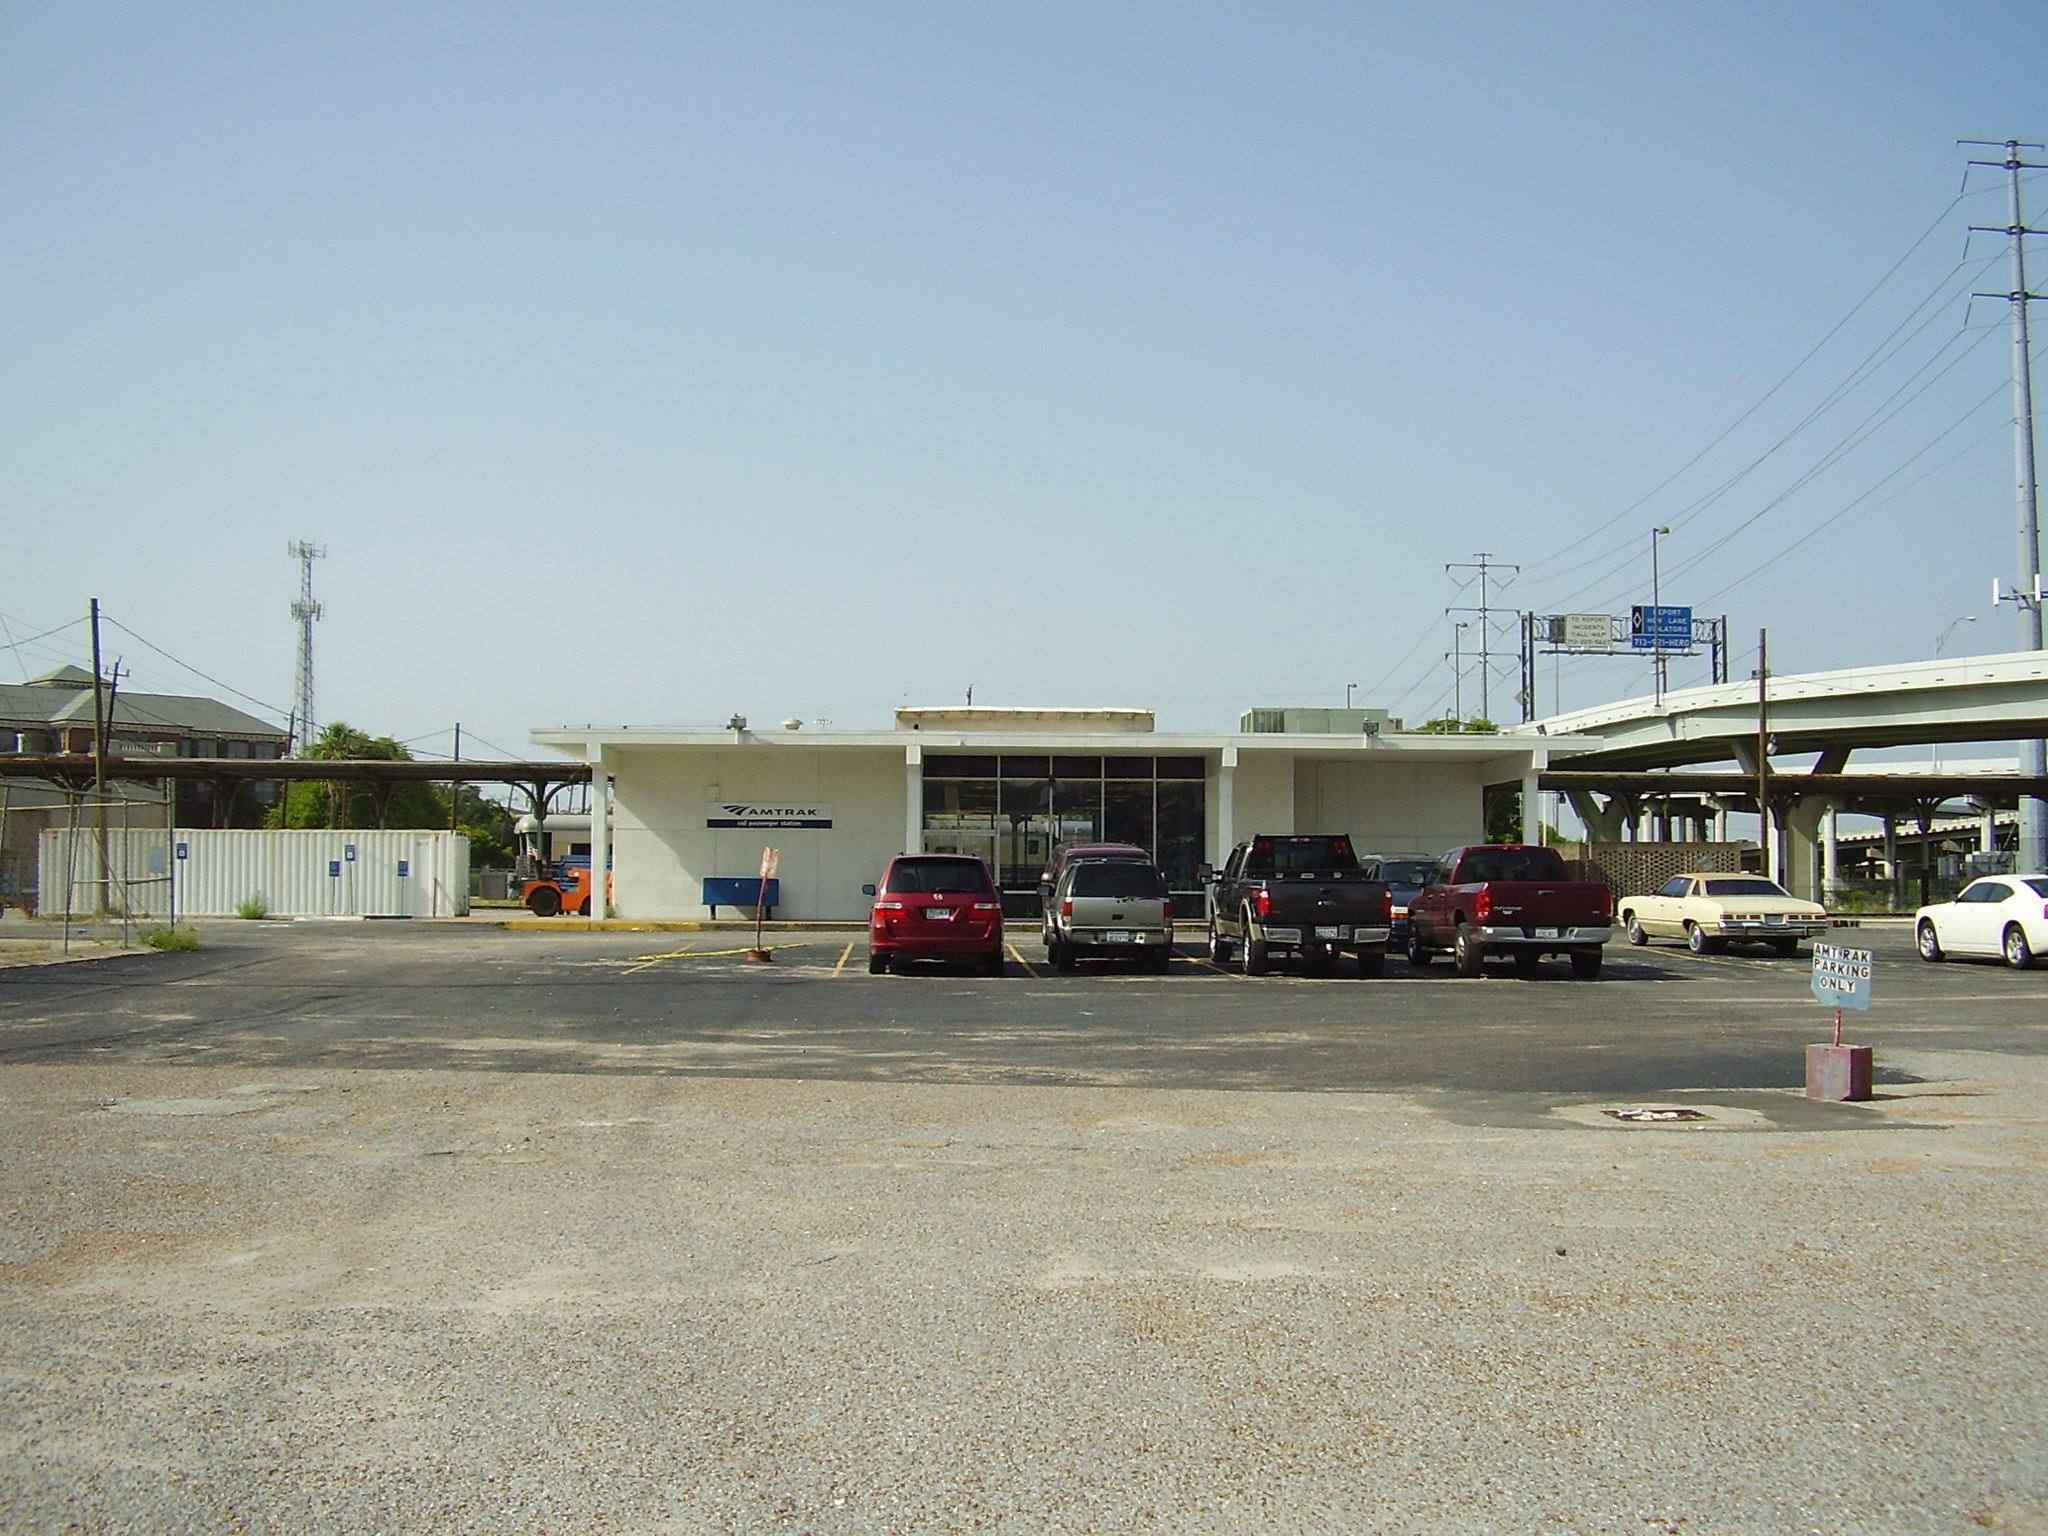 Ugliest train stations-Houston Amtrak Station